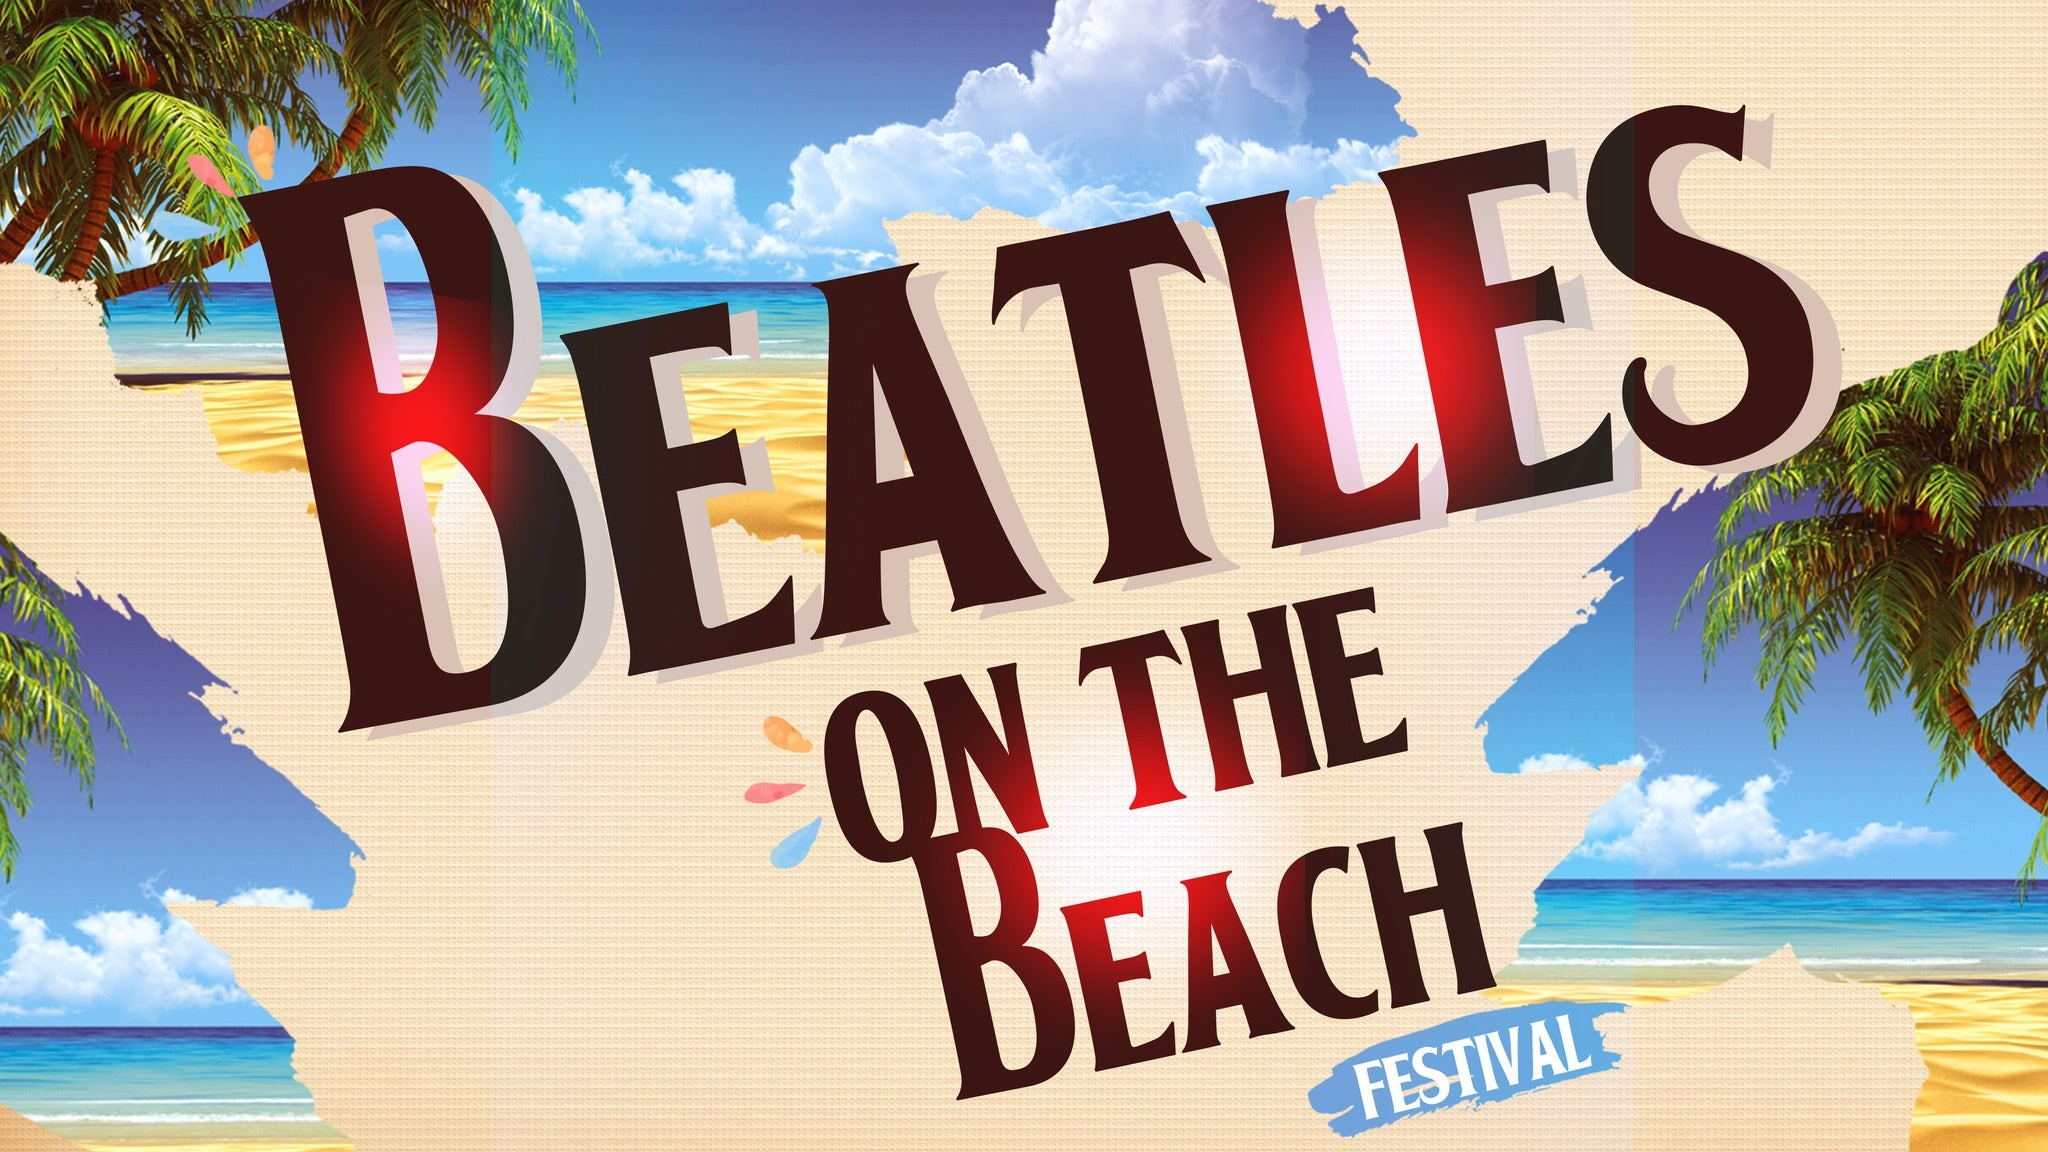 International Beatles on the Beach Festival